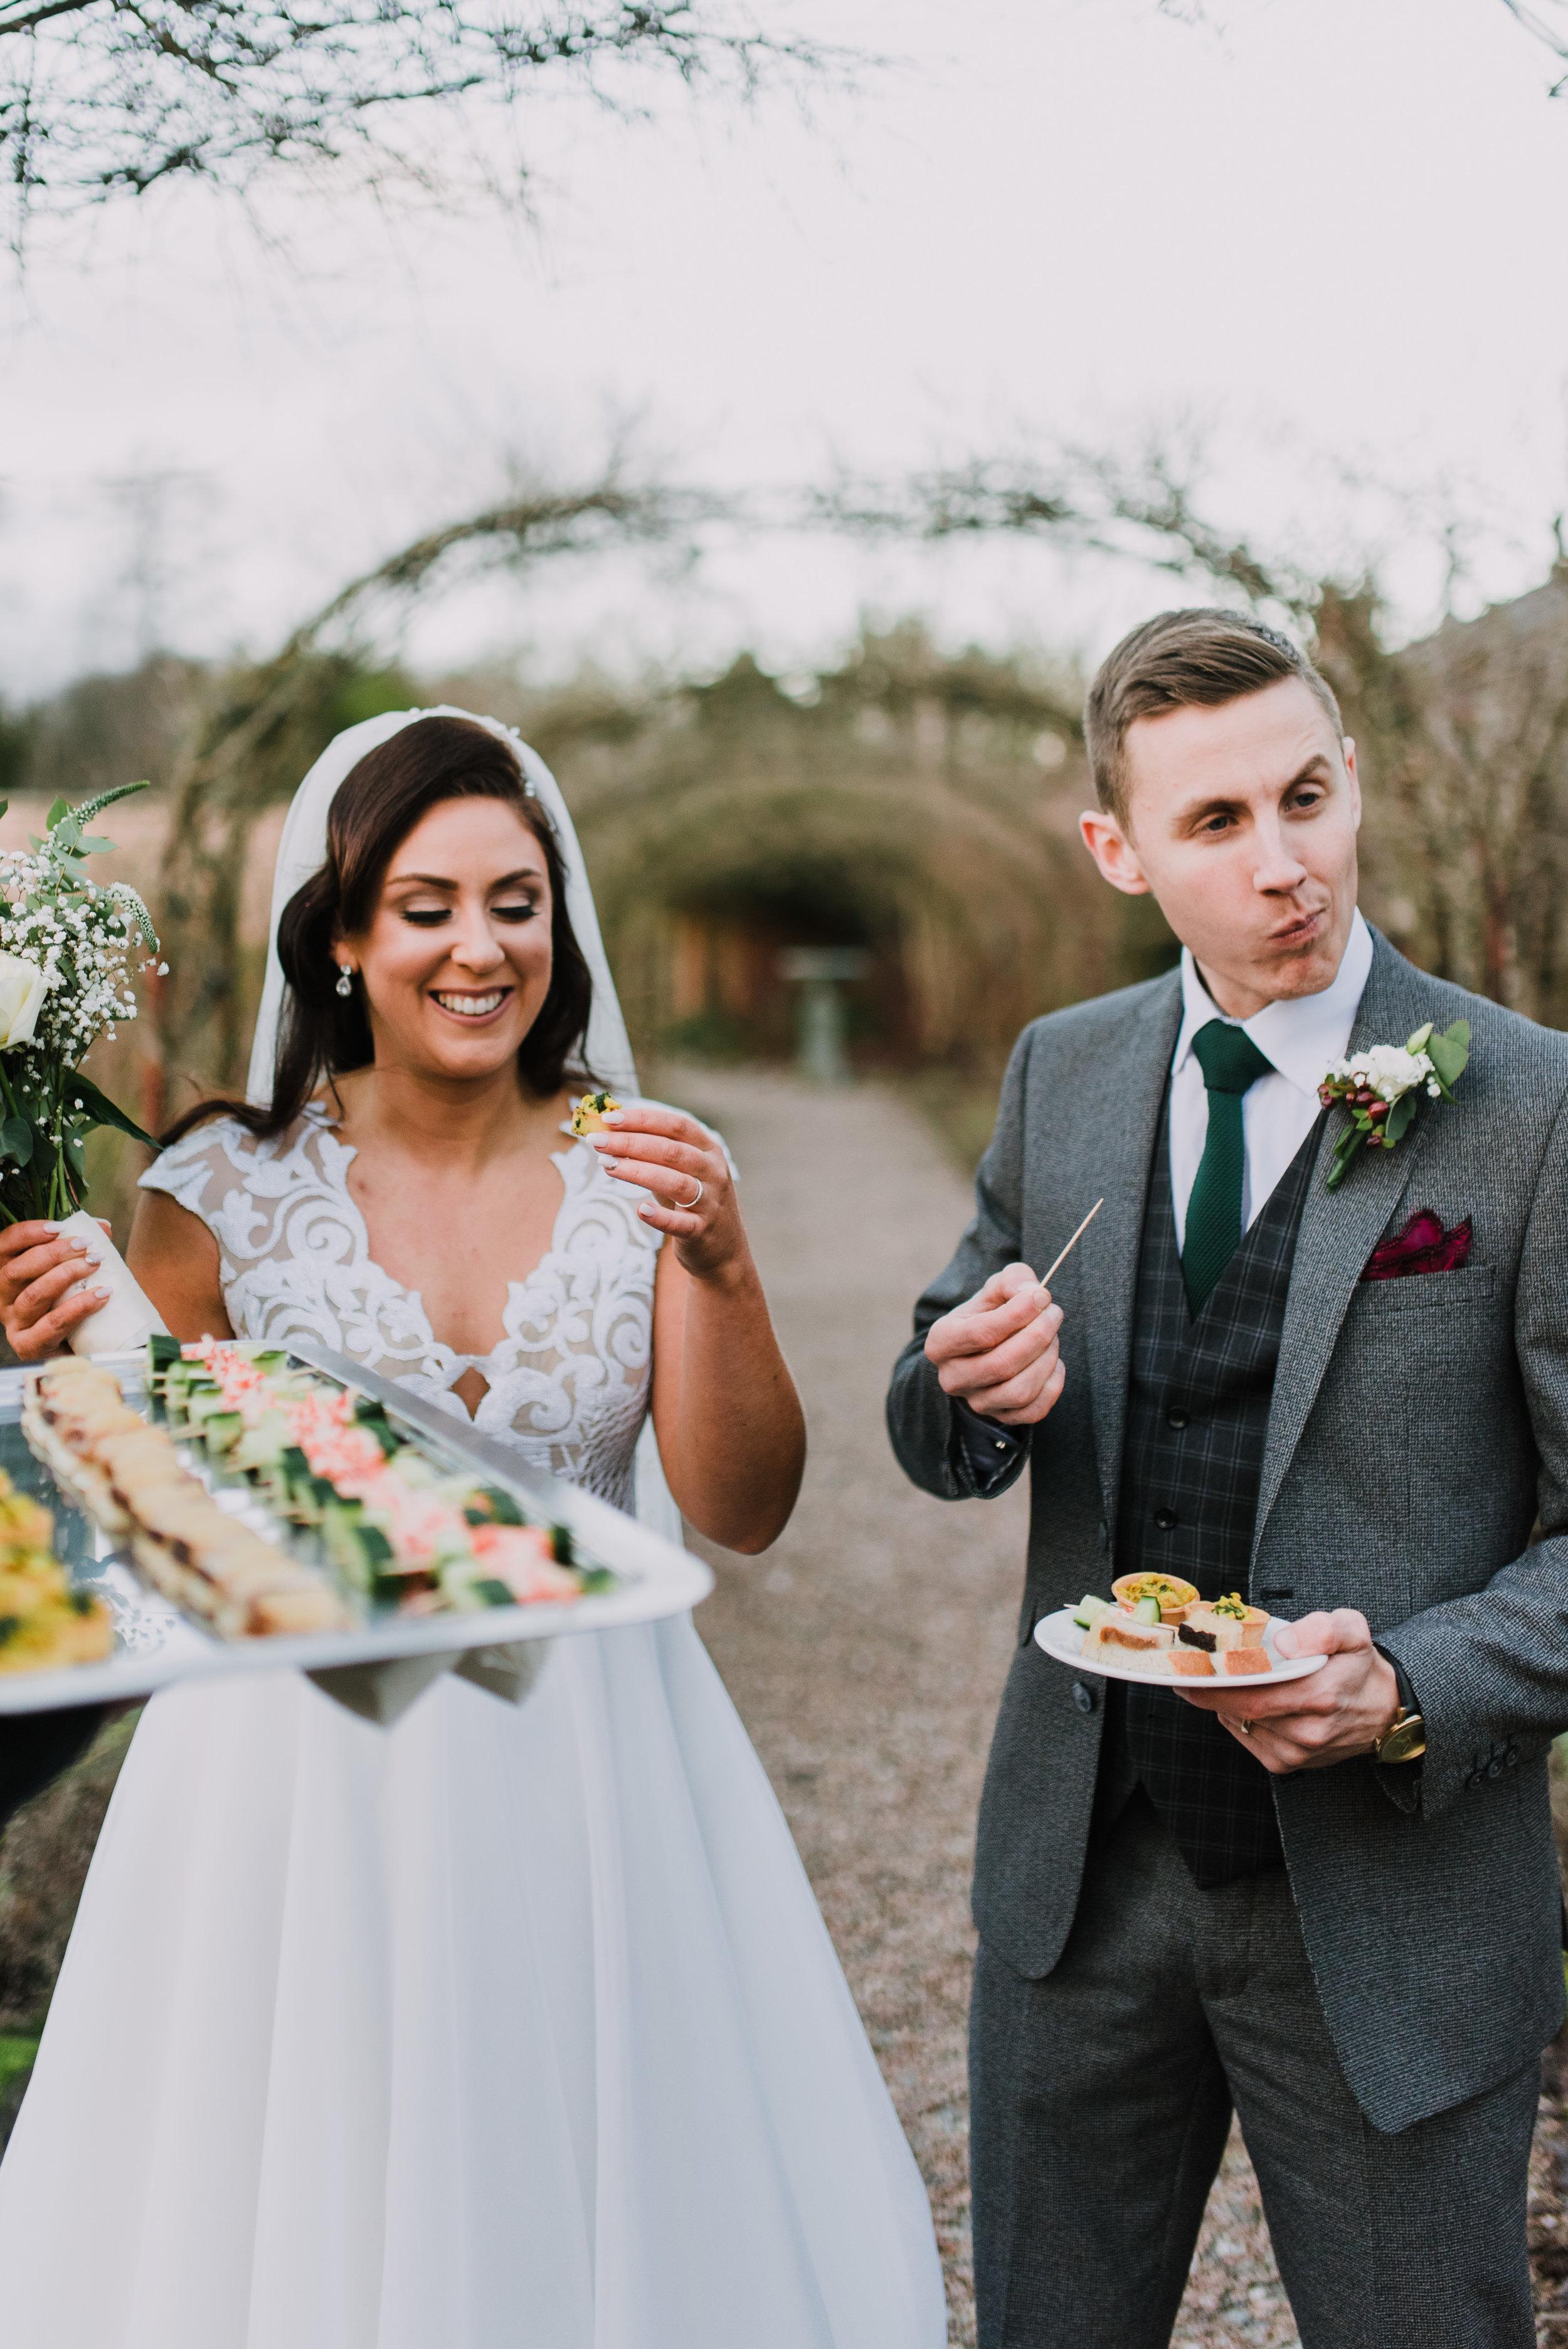 larchfield estate wedding, wedding venues northern ireland, barn wedding venues northern ireland, quirky weddings ni, wedding photos larchfield estate, shane todd's wedding (7).jpg